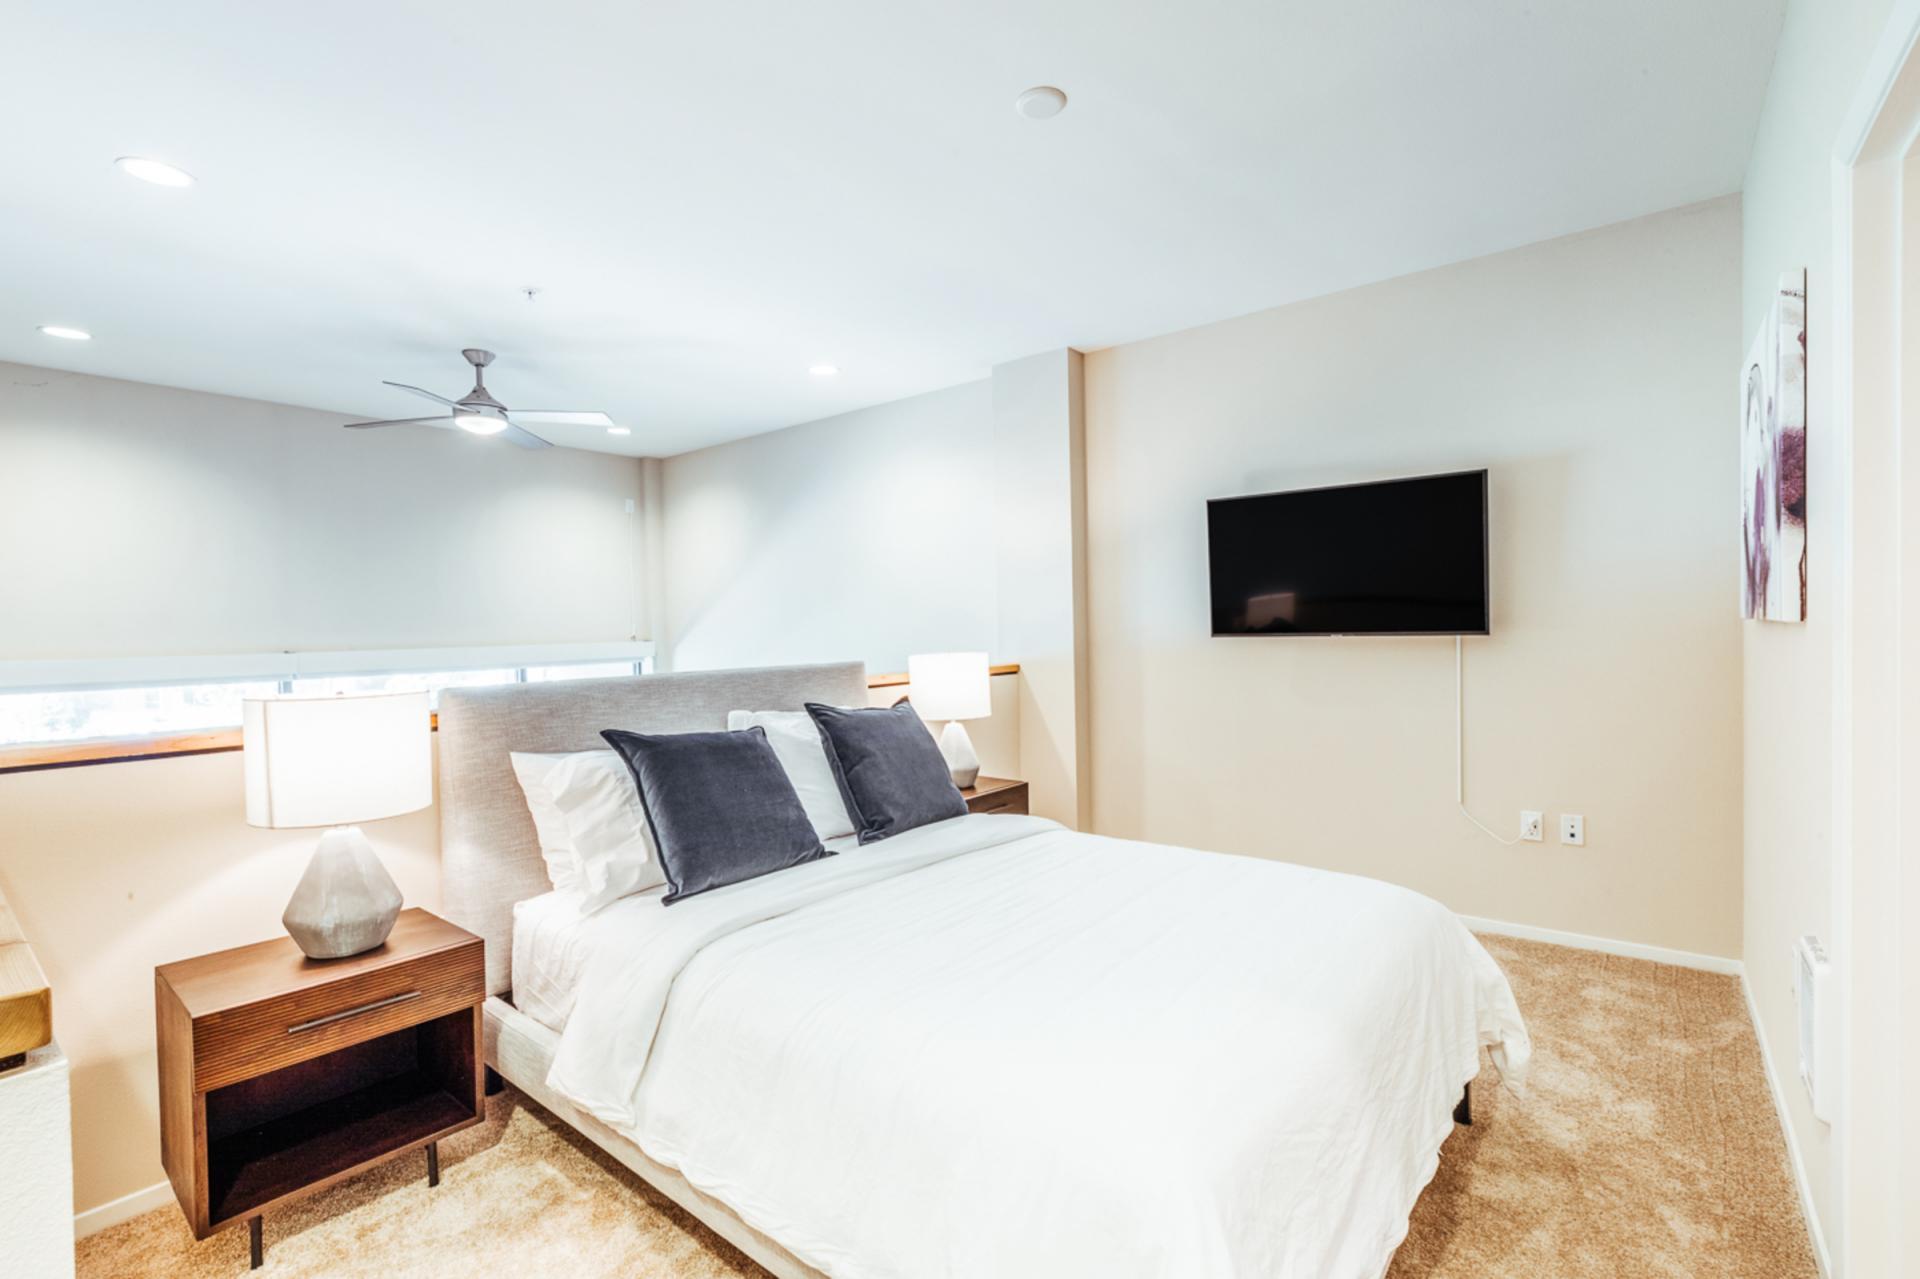 Bedroom at Landing Furnished Apartments at MB360, Mission Bay, San Francisco